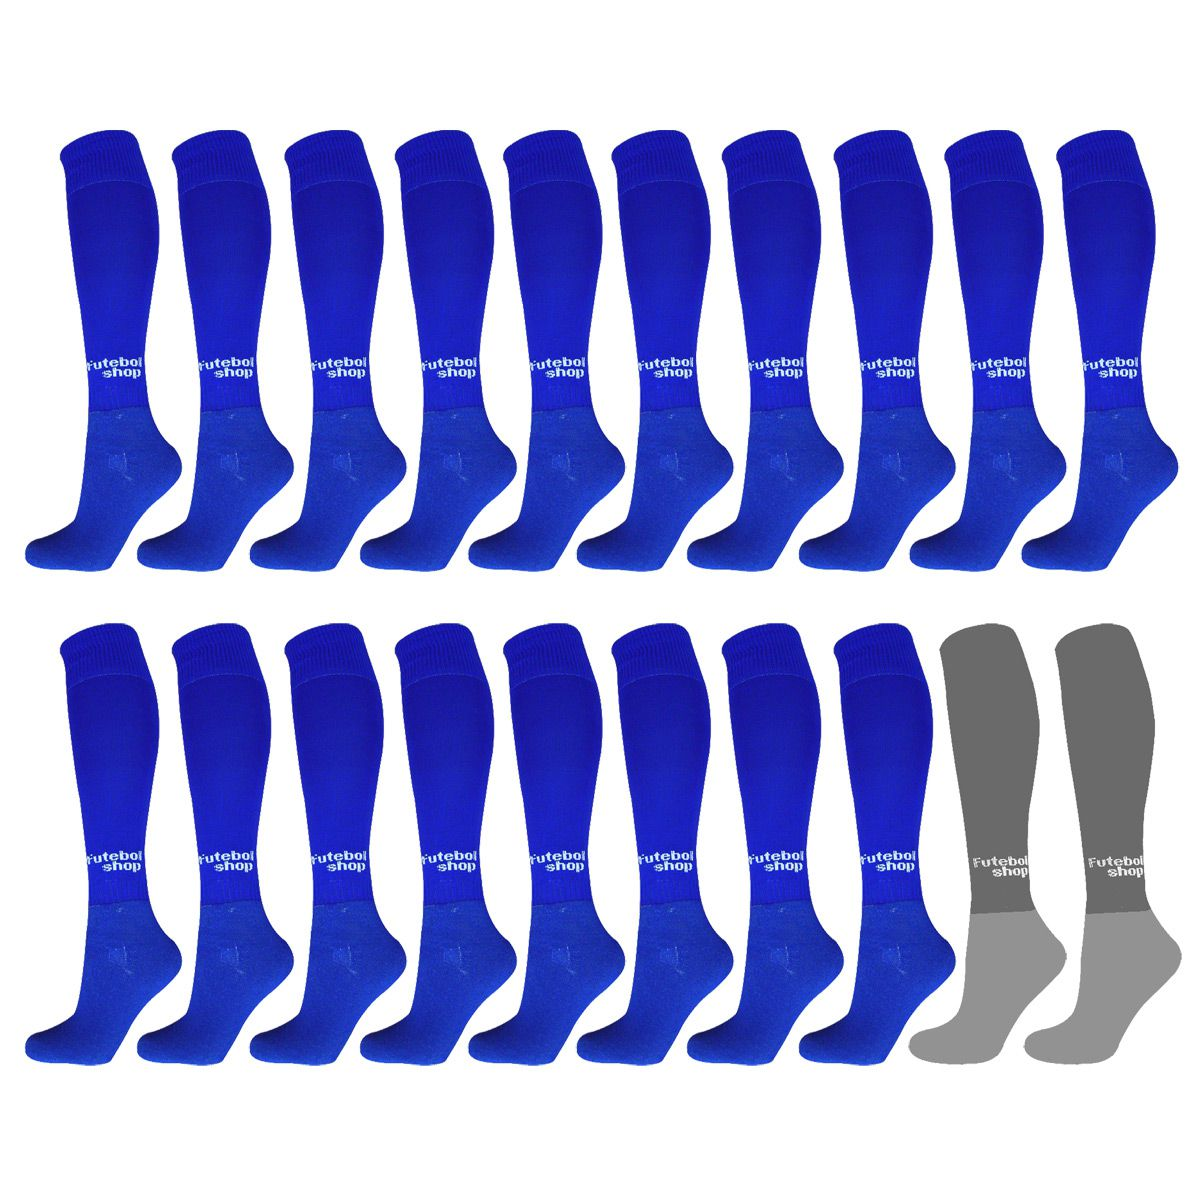 Kit C/ 20 Pares Meião Futebol Adulto (Azul Royal + Cinza) - 39/44